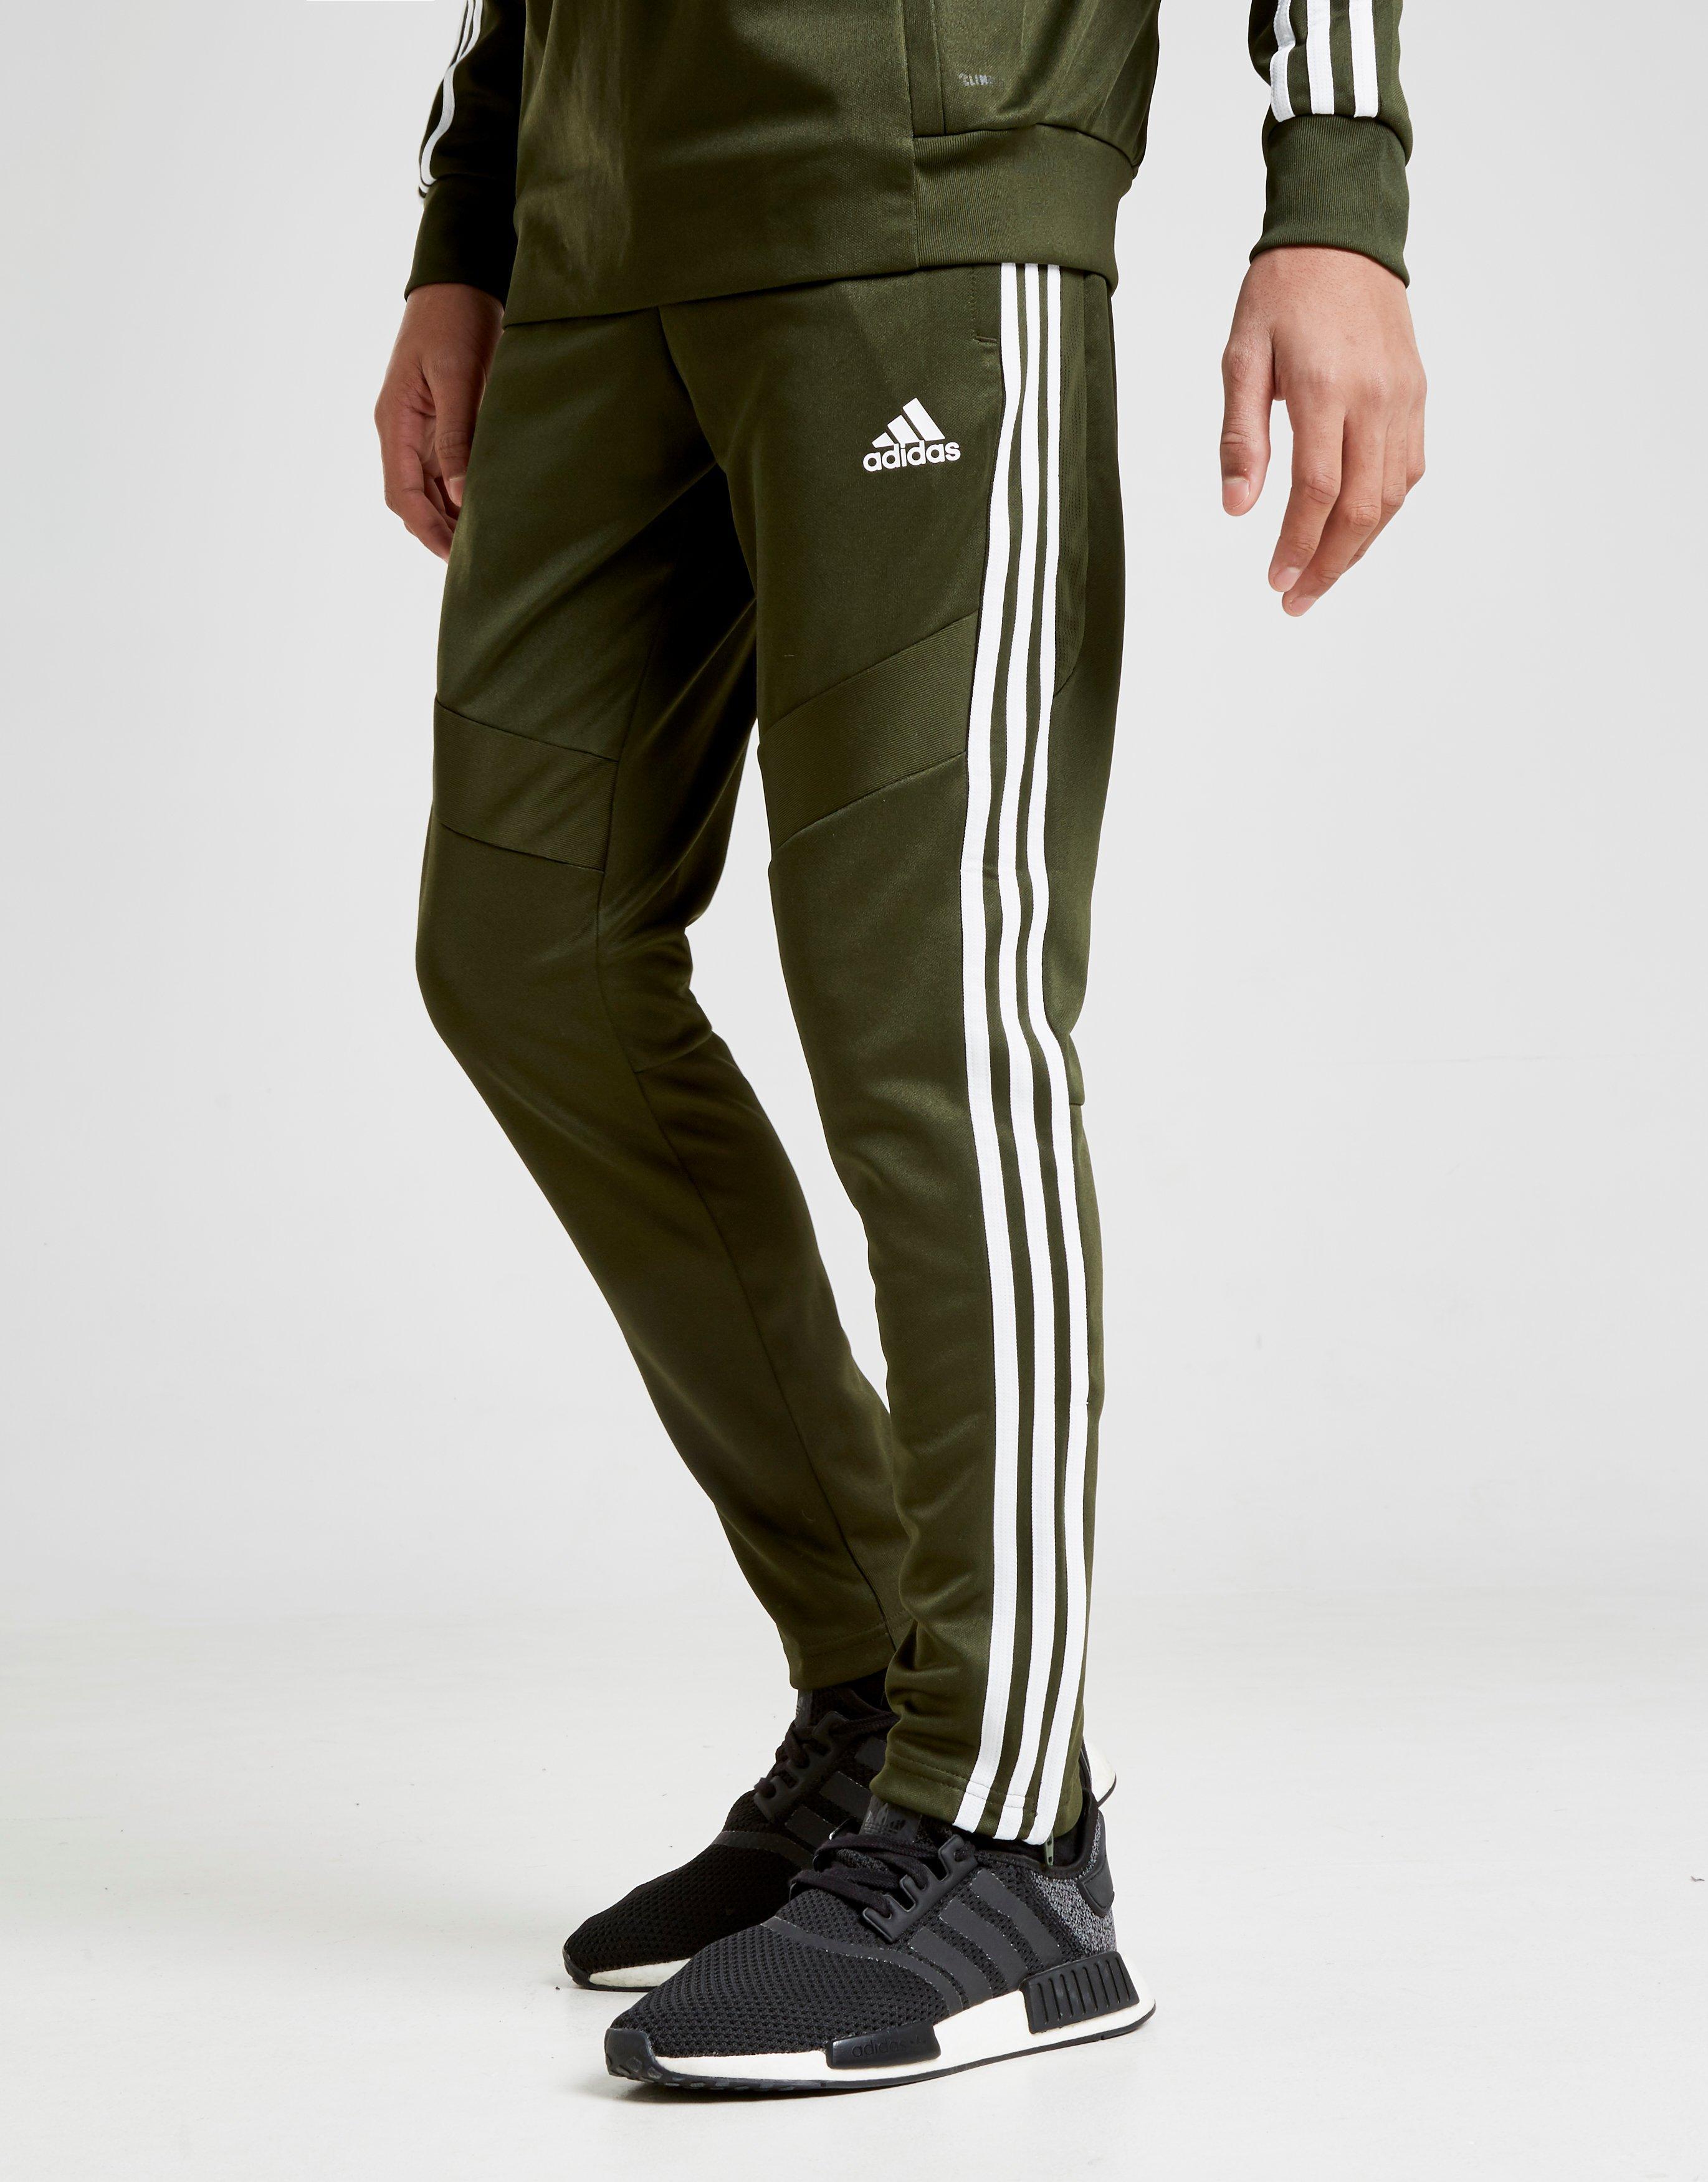 adidas pants jd